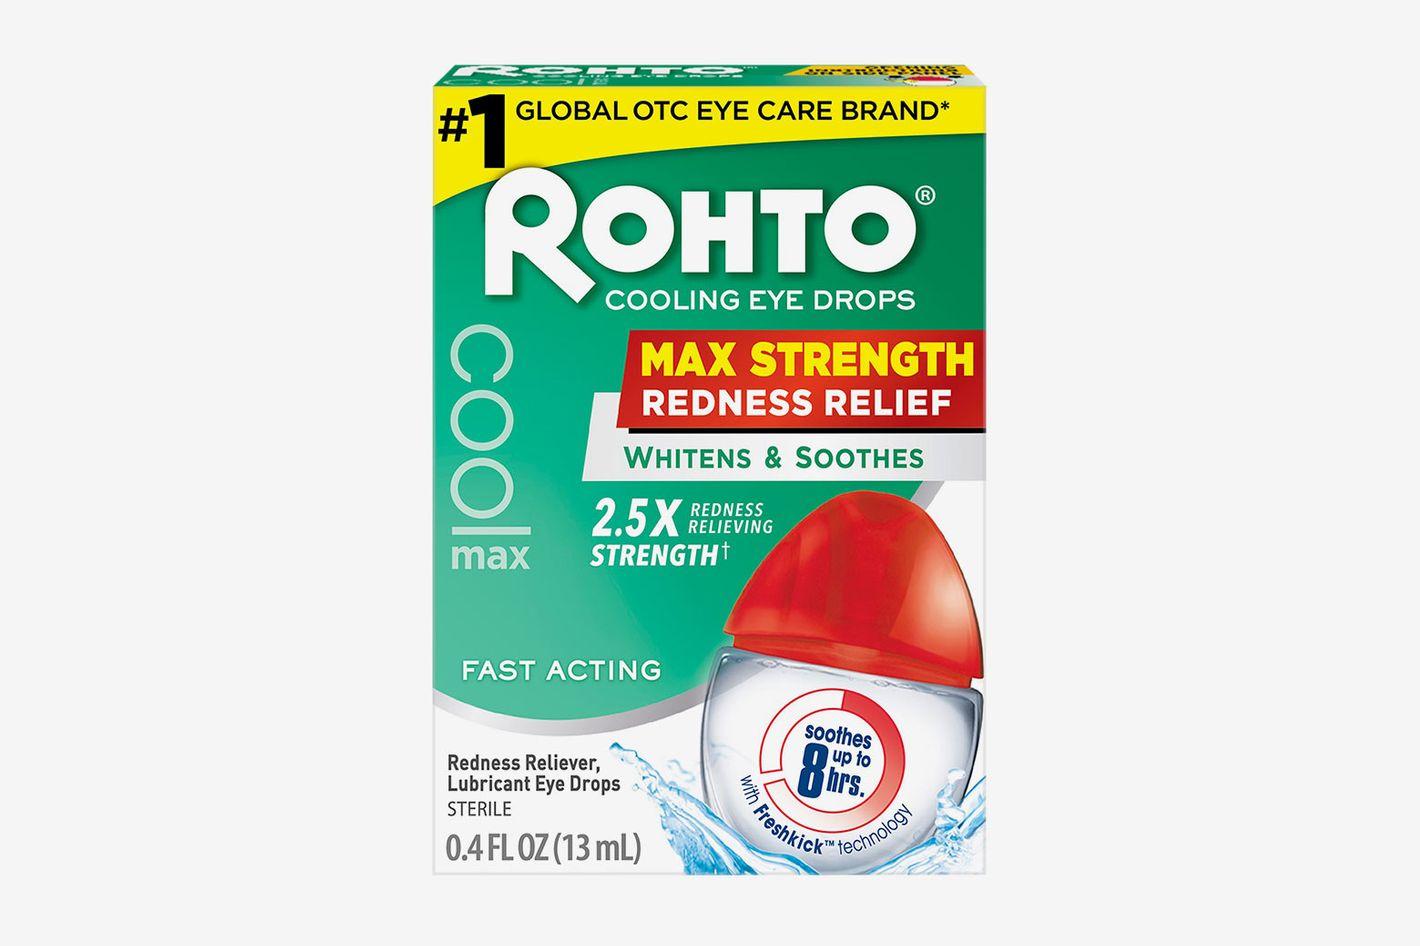 Rohto Cooling Eye Drops